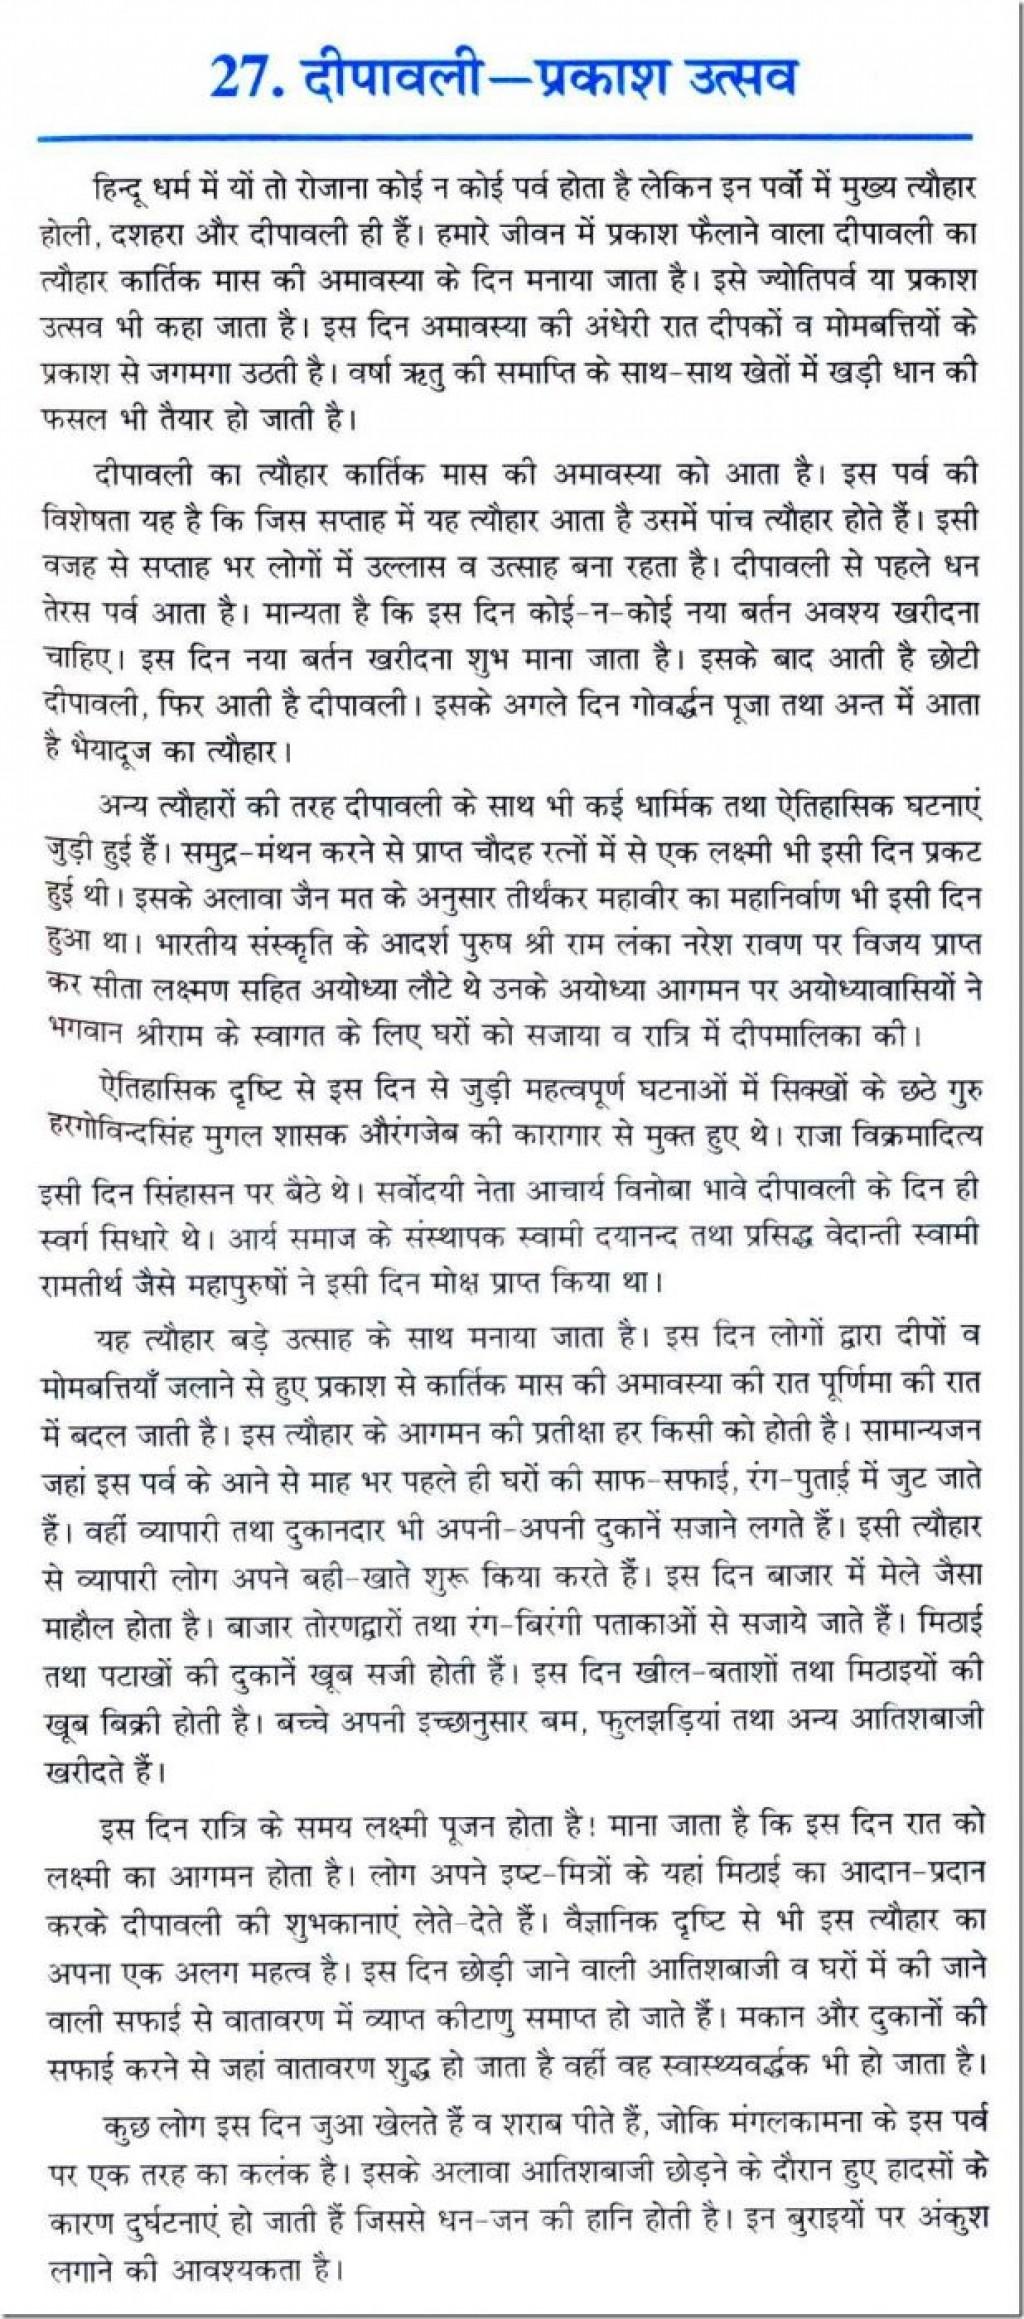 020 Deepavali Essay Writing Service Recommendation Thumb About In Marathi Telugu Kannada Hindi Spm Sanskrit Tamil English Mai Bengali 618x1400 Example Unbelievable Festival Christmas Language Diwali Large